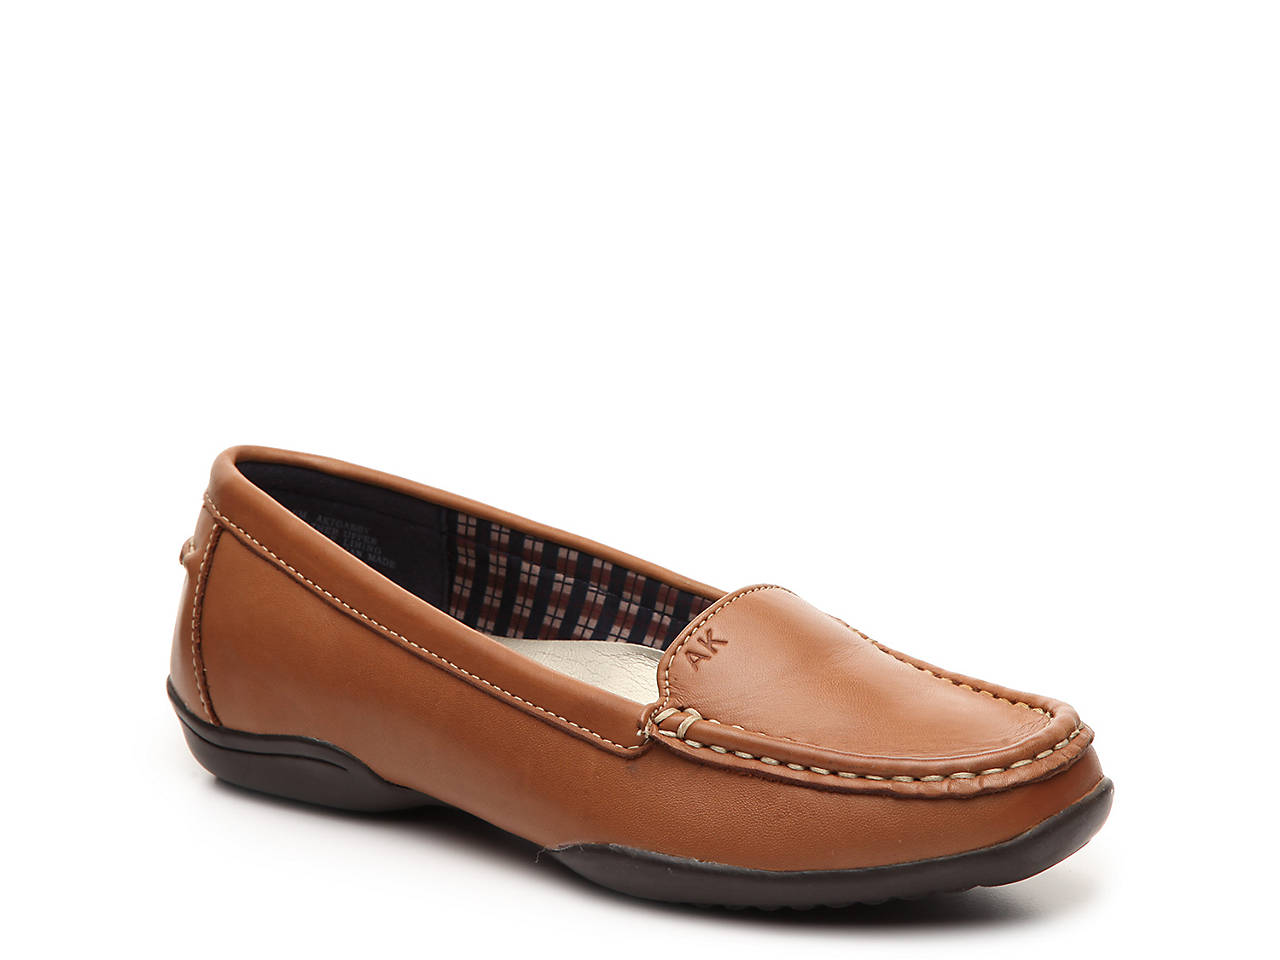 ee374f2f7f9 Anne Klein Gabby Loafer Women s Shoes